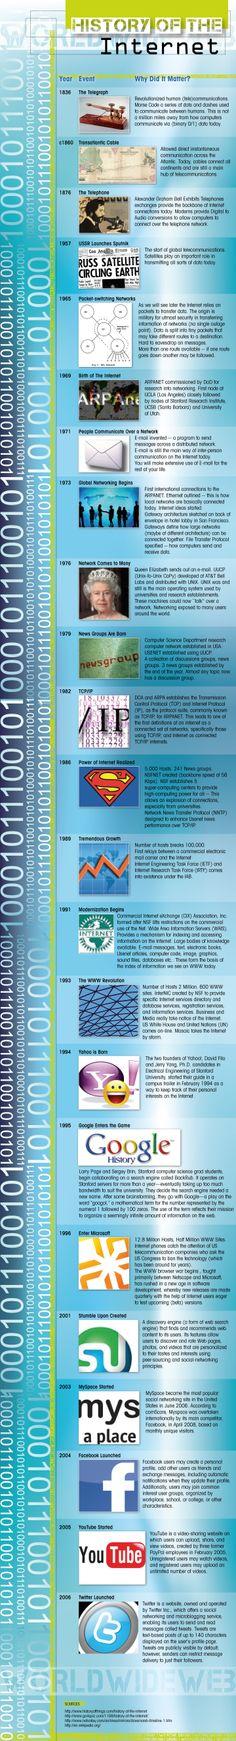 internet-history.jpg (720×5313)